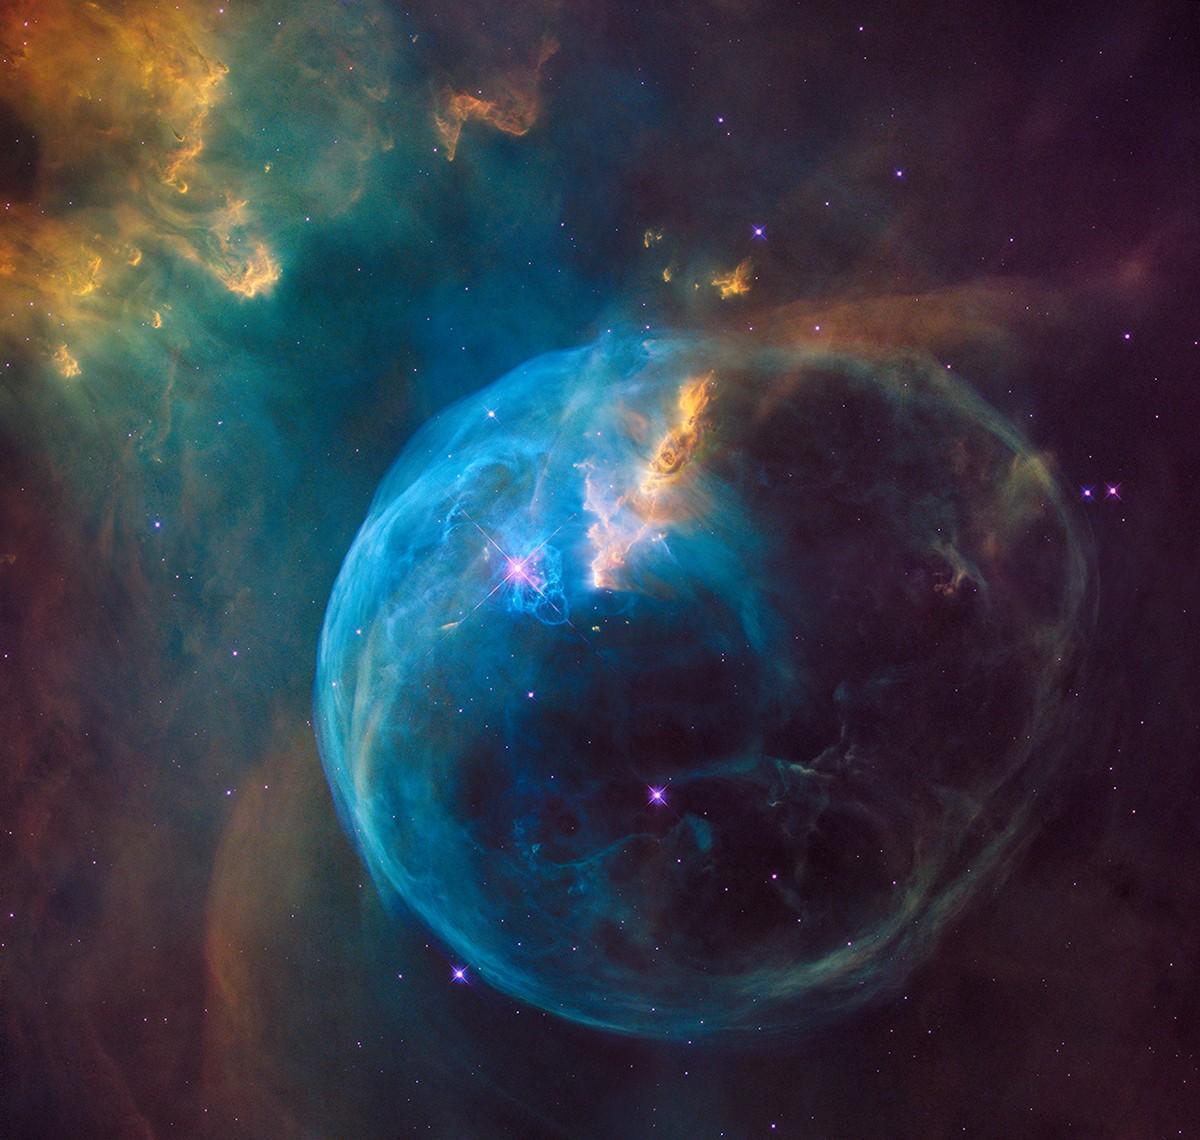 Nebulosa-bolha